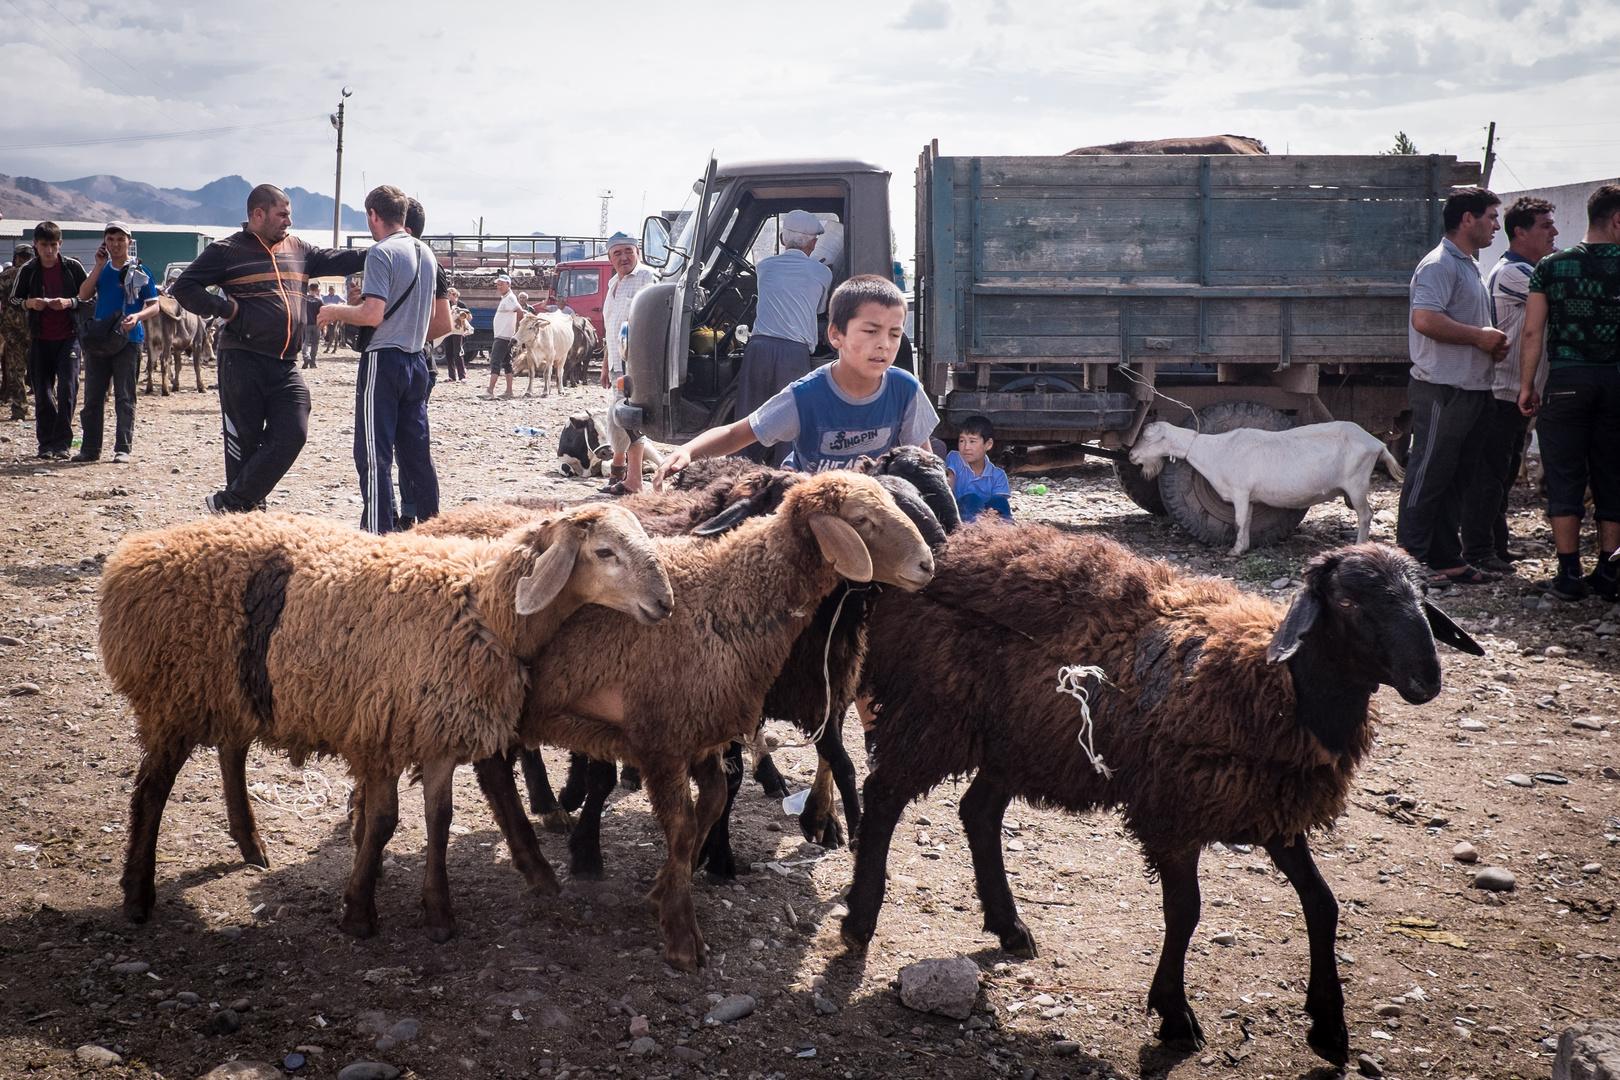 Viehmarkt in Tokmok (Kirgisistan) - August 2013